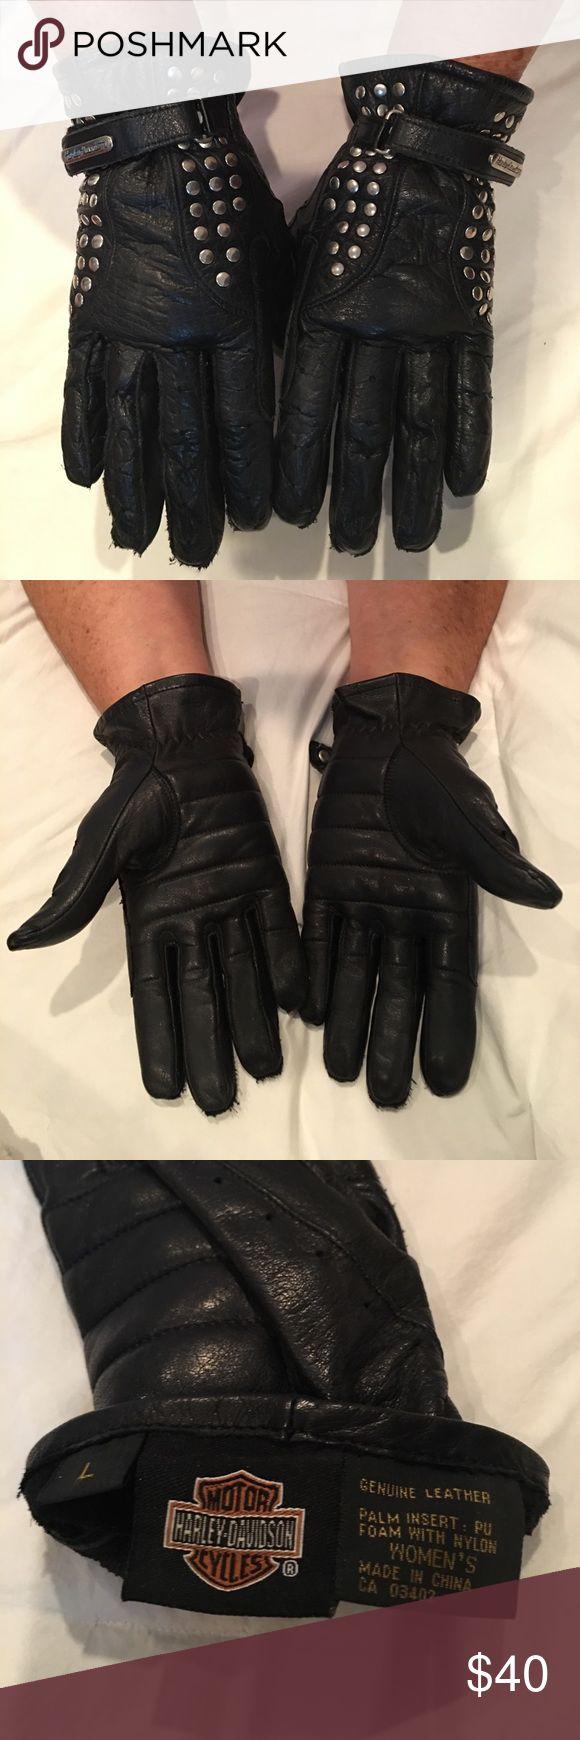 Leather work gloves ebay - Women S Leather Harley Davidson Gloves